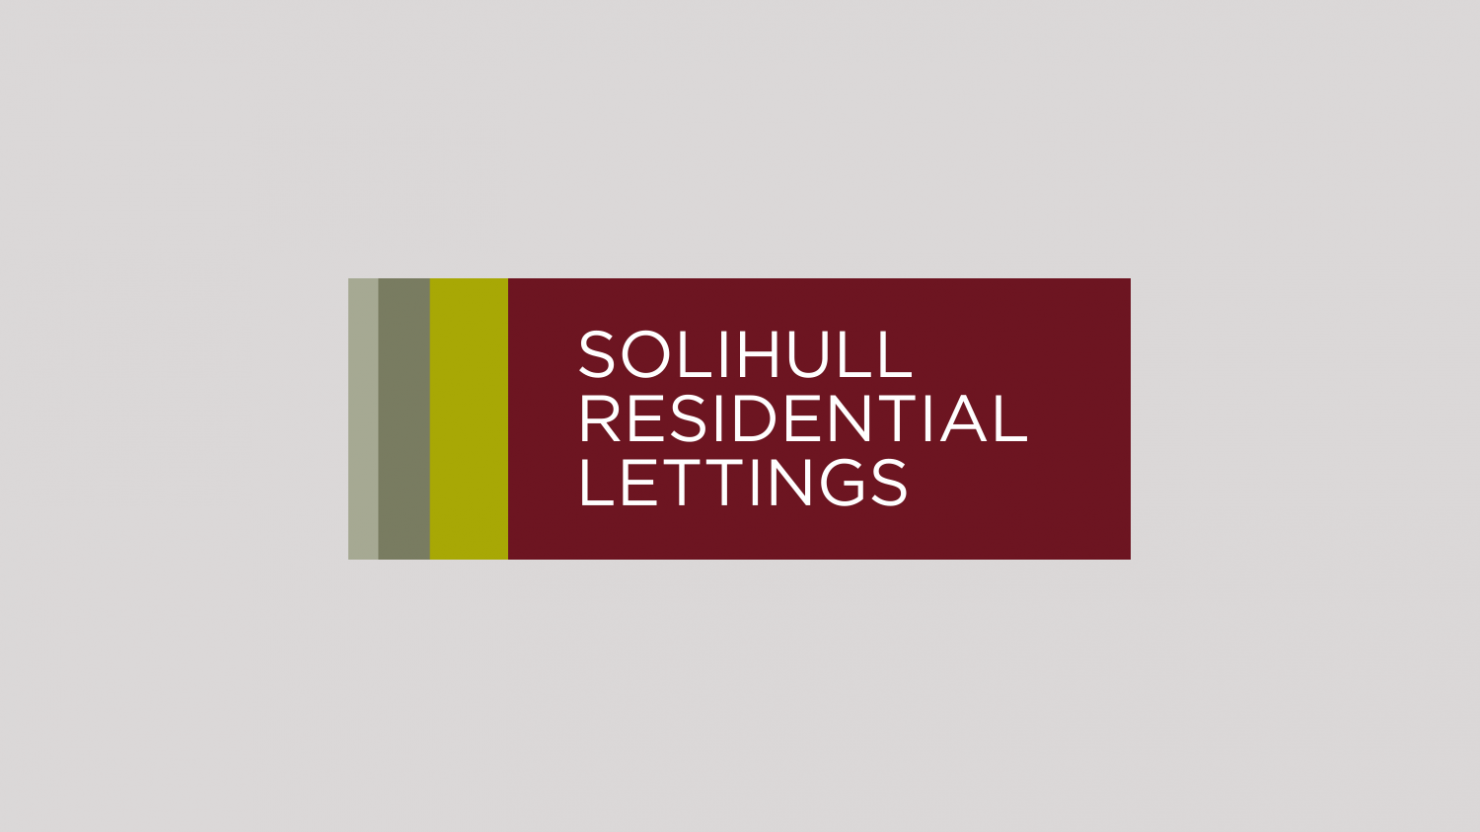 Logo design and branding for Solihull Residential Lettings